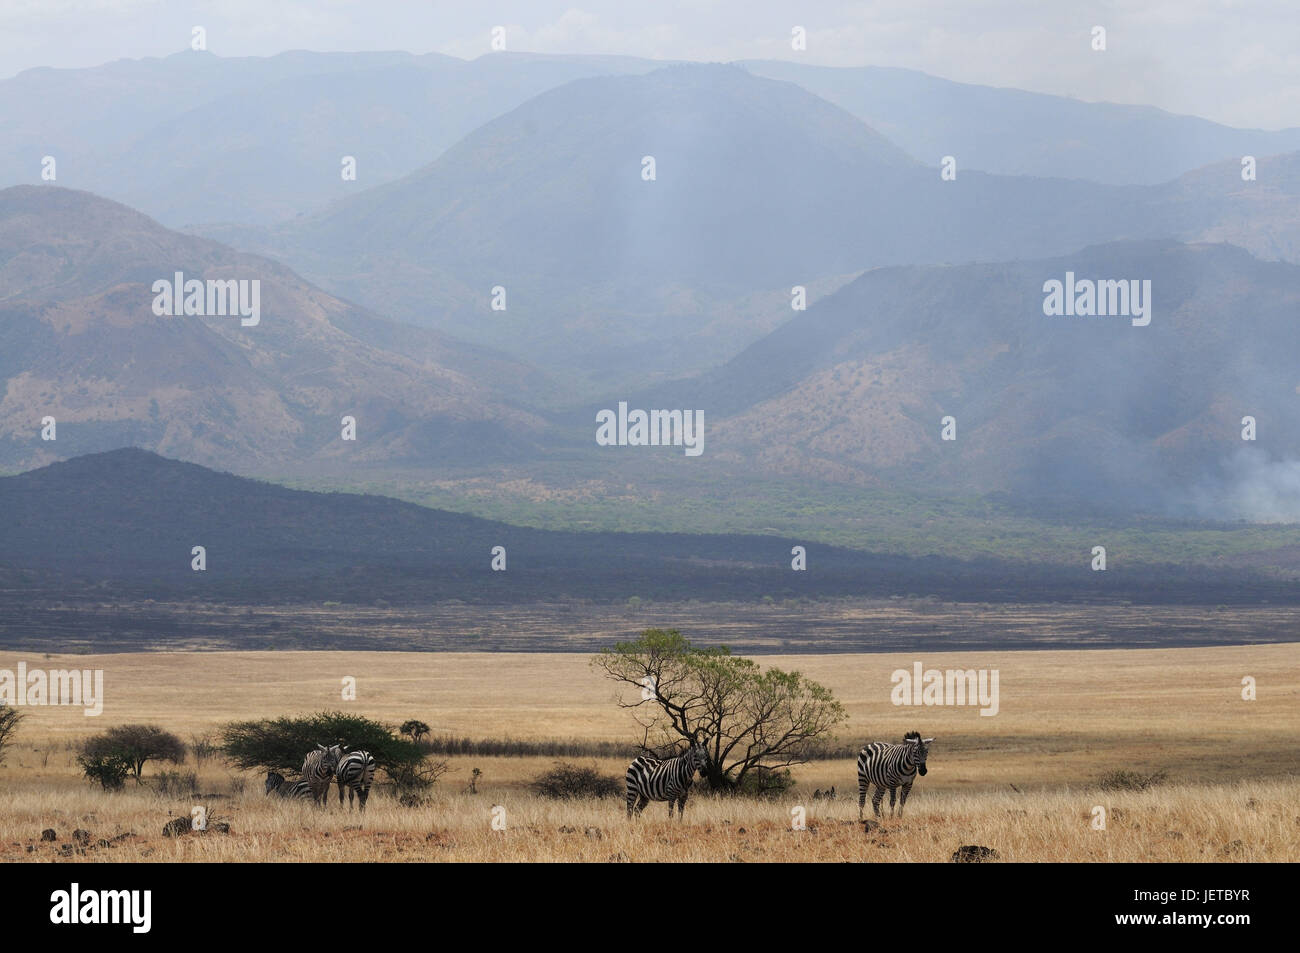 Zebras, steppe scenery, Nechisar national park, south Ethiopia, Stock Photo